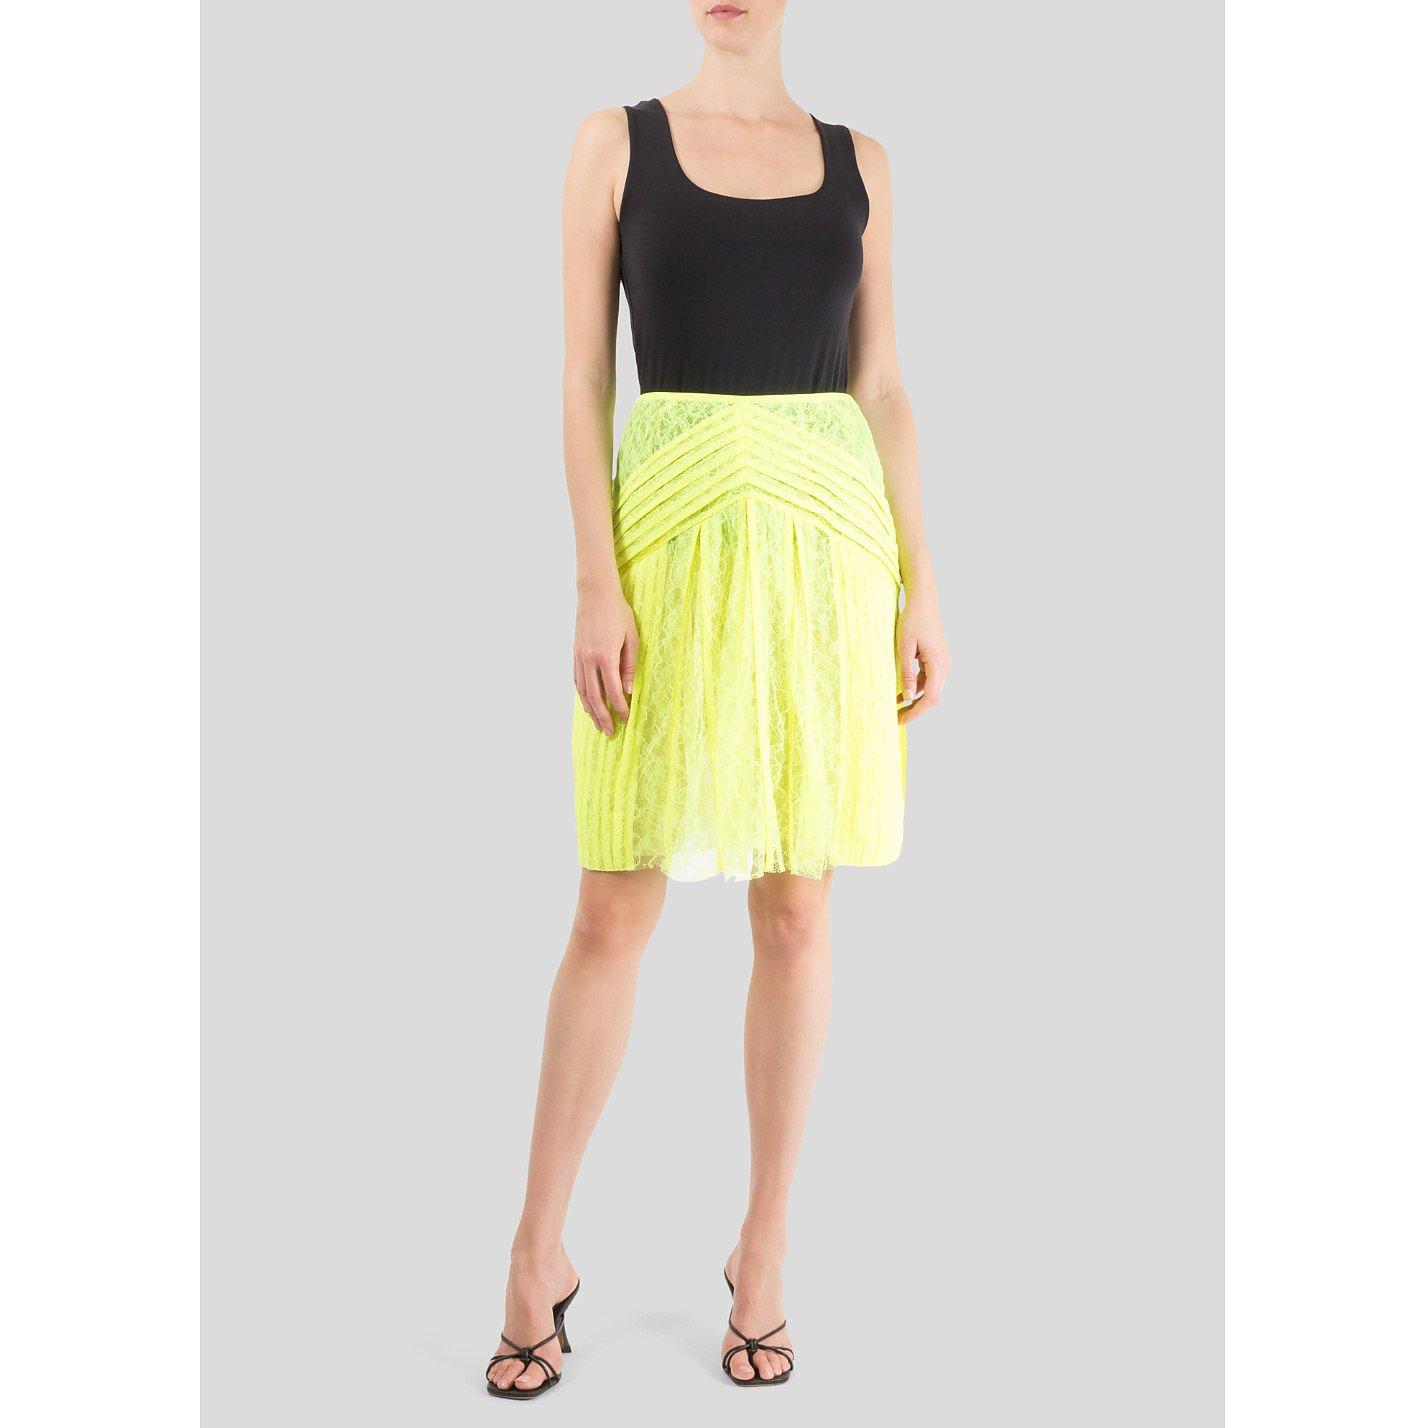 Christopher Kane Keke Neon Lace Skirt